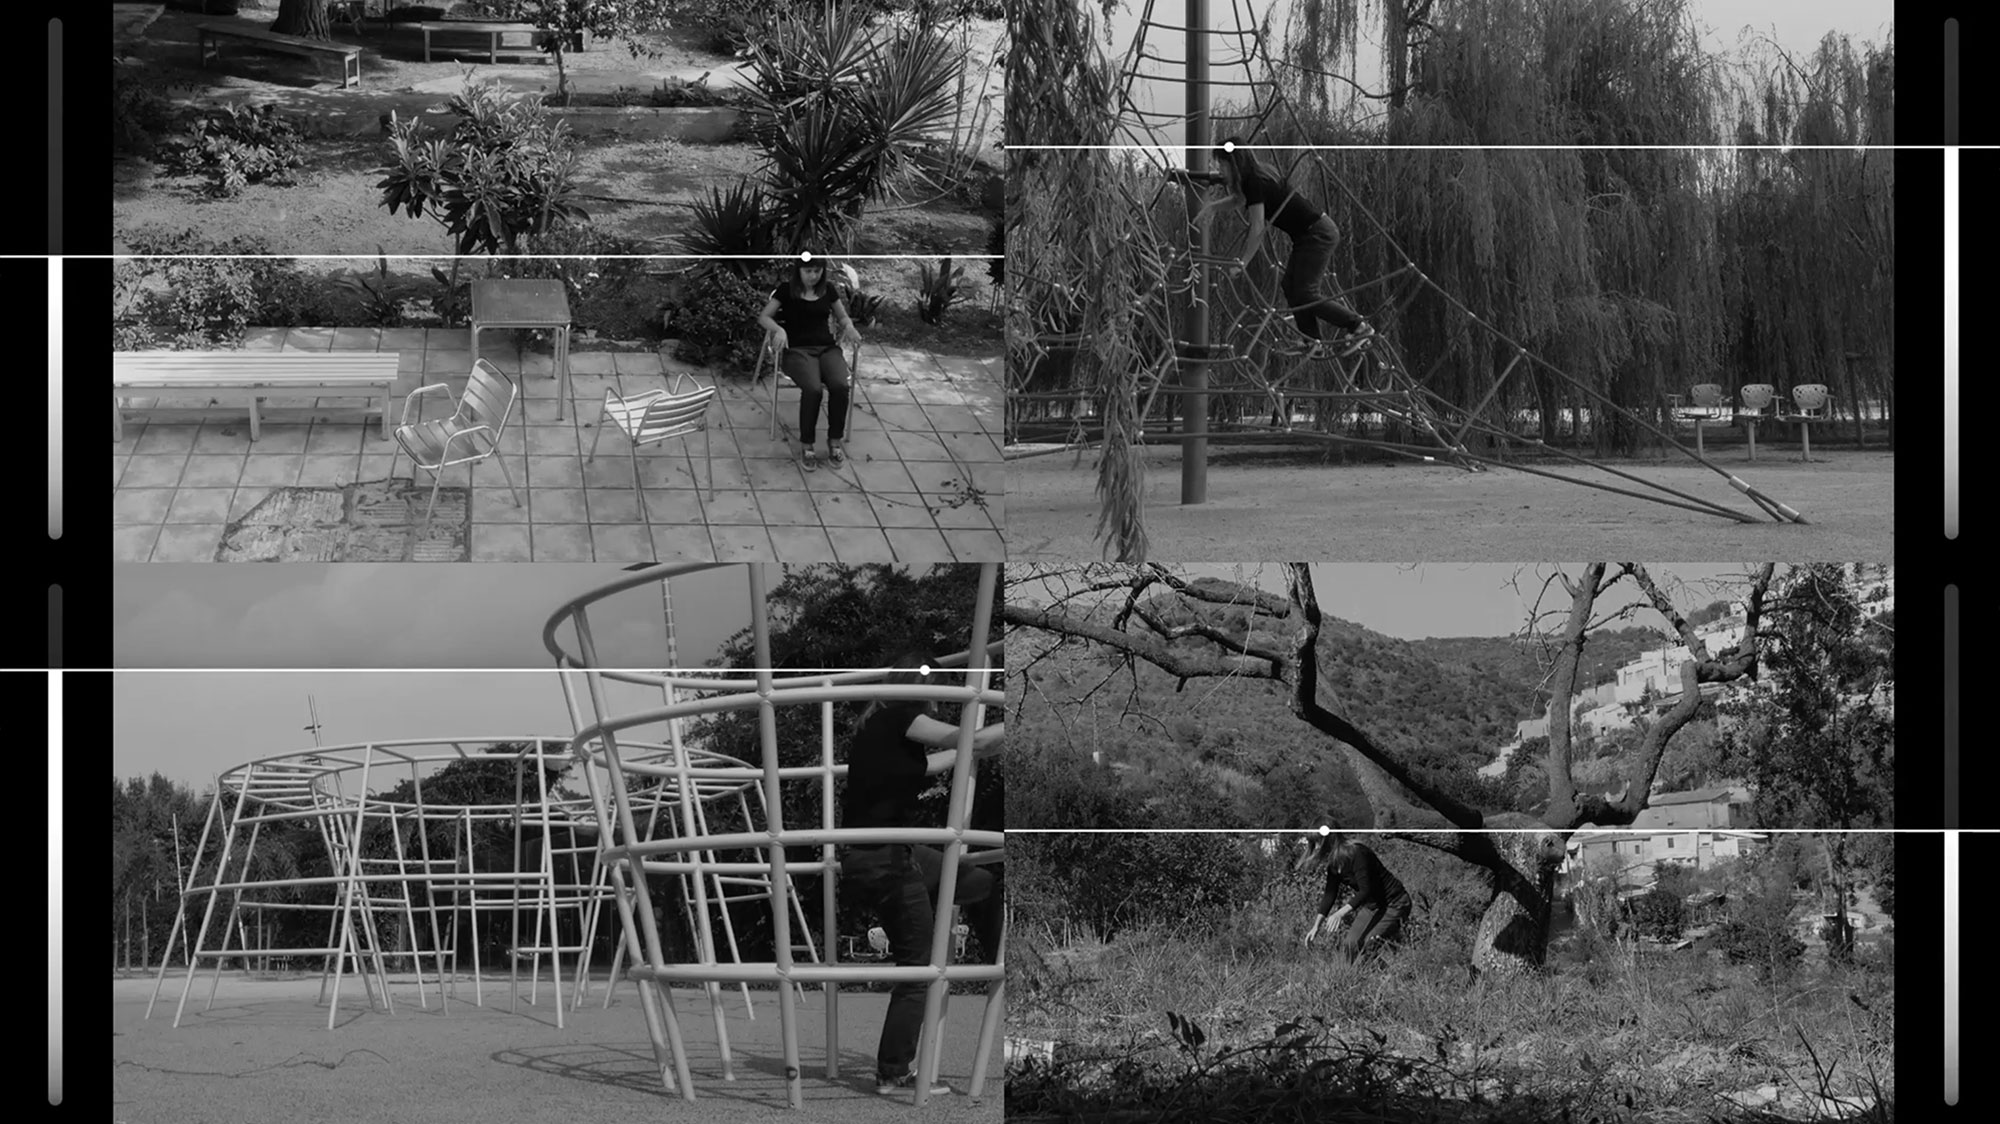 Jacek Doroszenko - The same horizon repeated at every moment of the walk - video 01